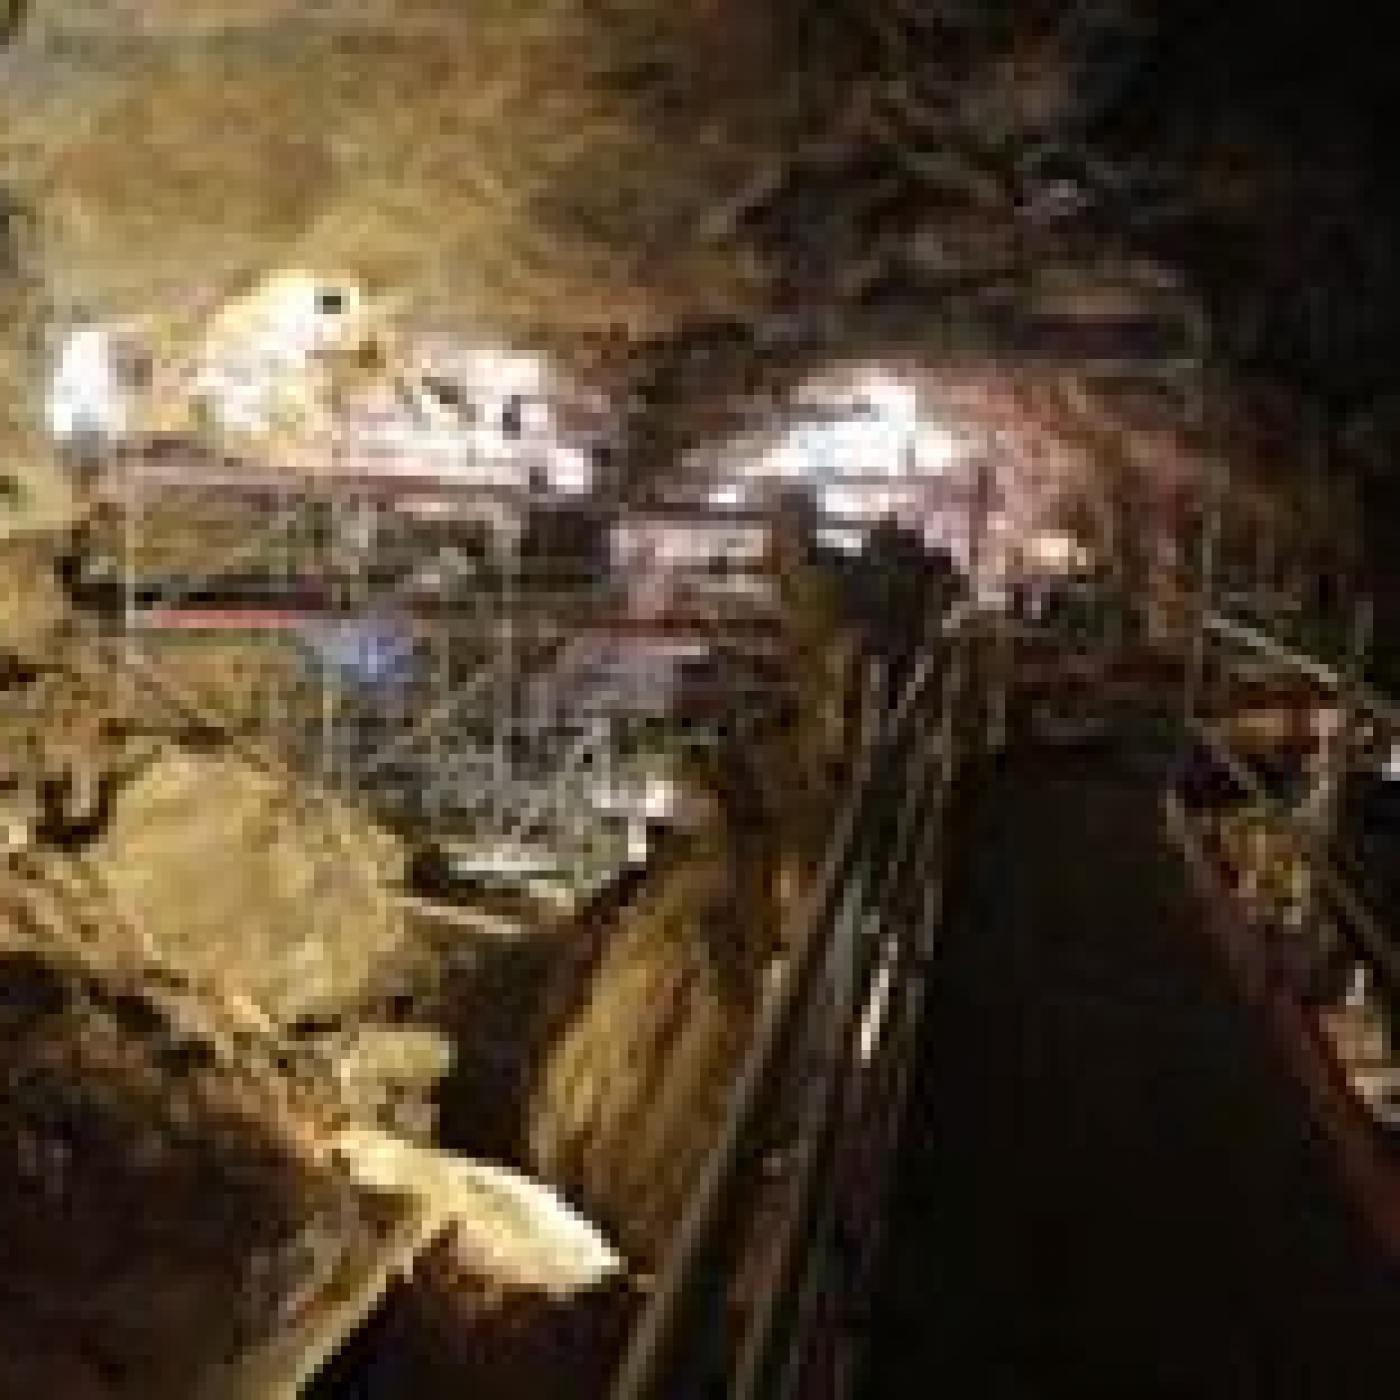 La Fibula 01 x 36 - Cueva Victoria (G Toro) y Destino ArqueoTrip